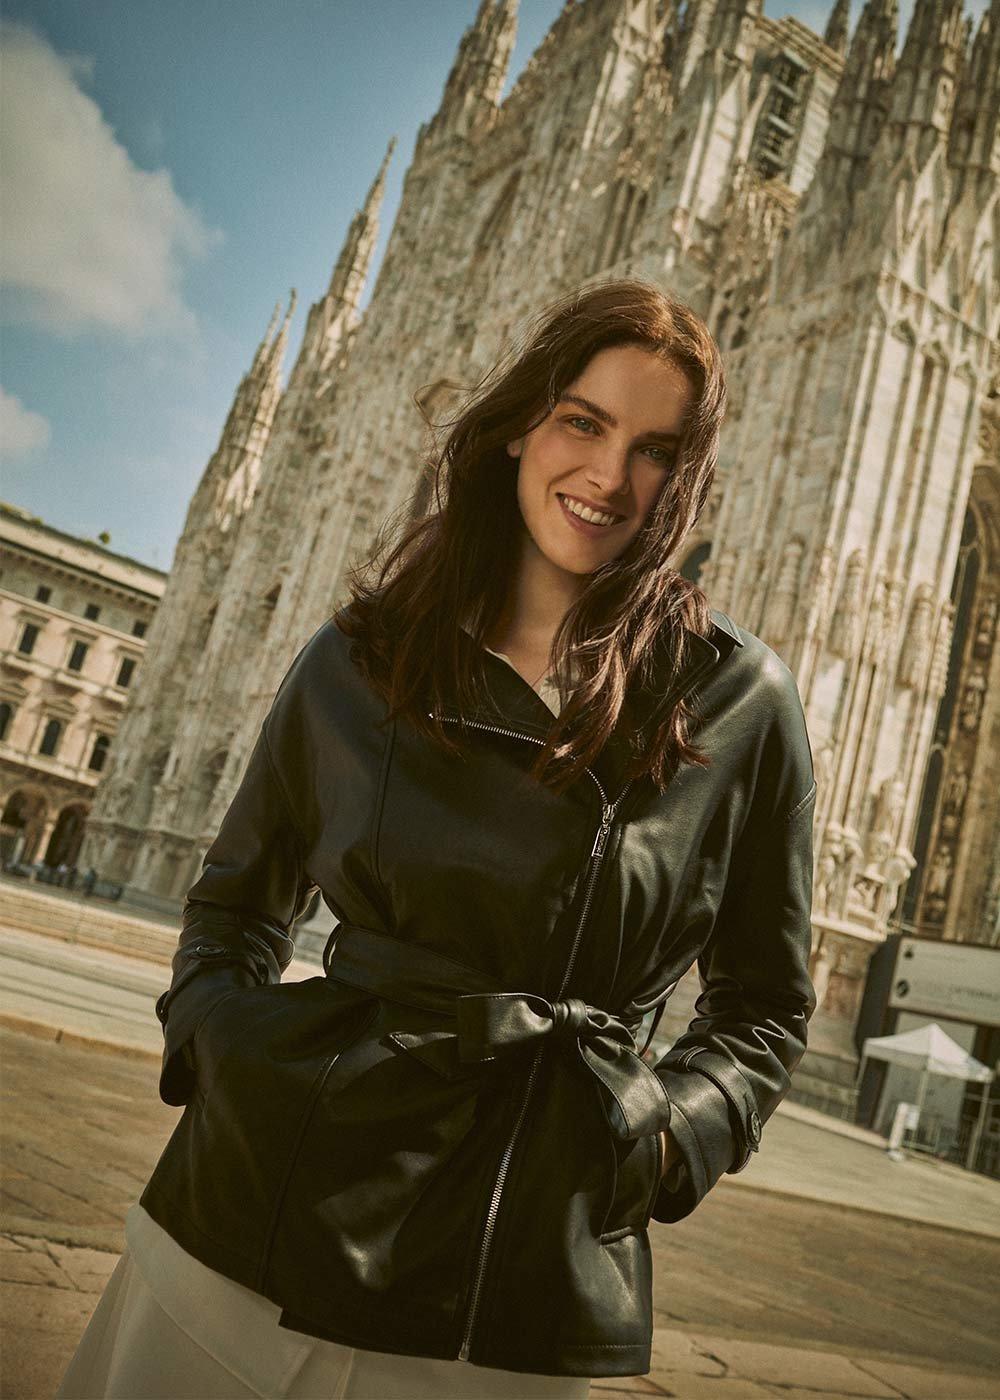 Gil faux-leather jacket - Black - Woman